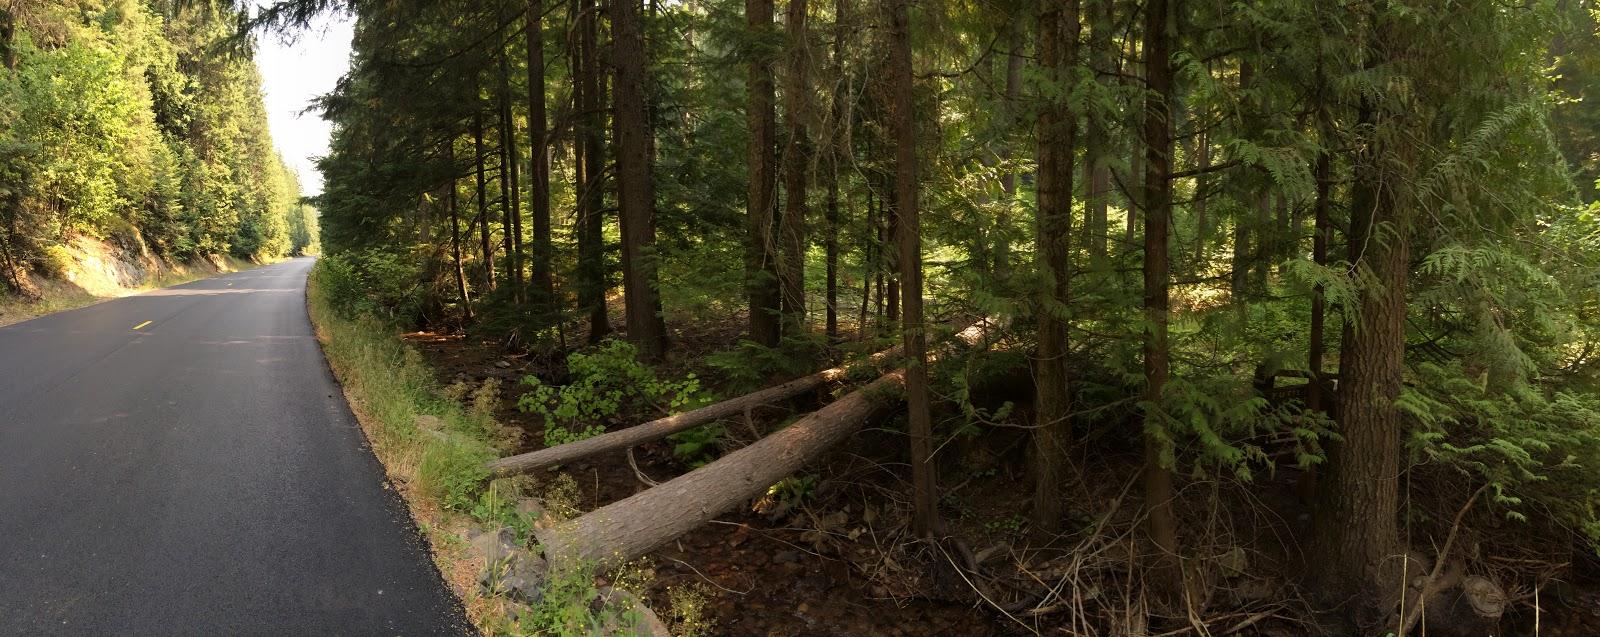 Climbing Mt. Spokane Park Drive by bike - roadway and log bridge across creek